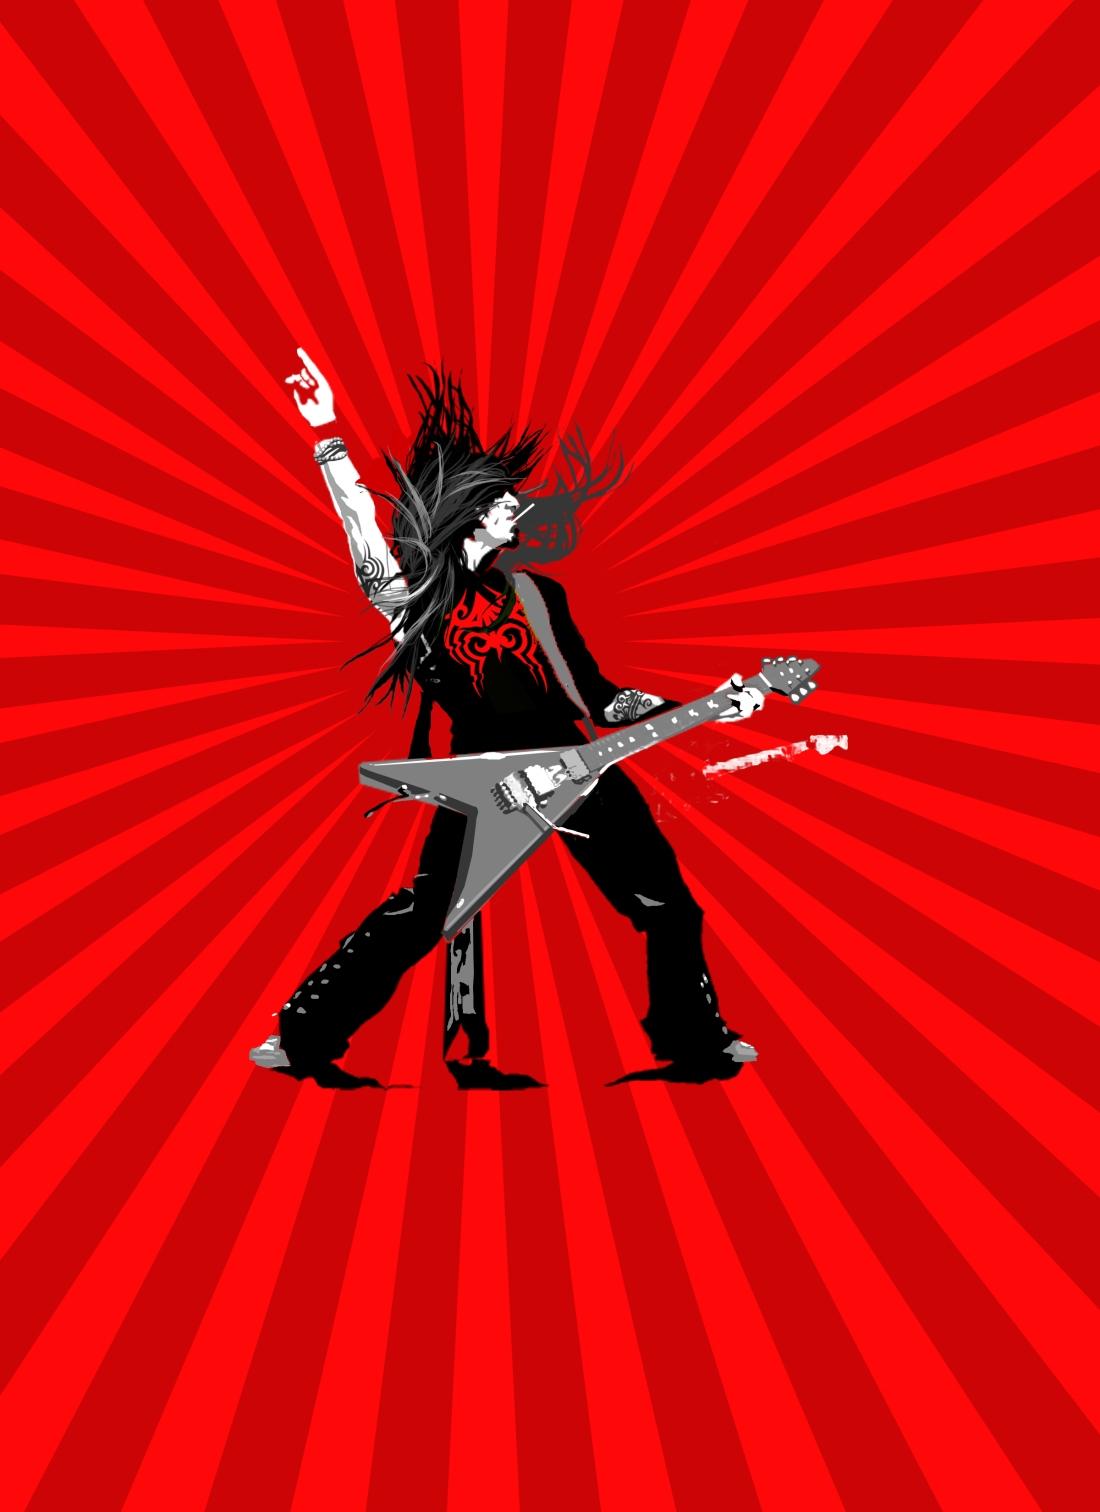 Gary_Freeman_illustration_Guitar player2b